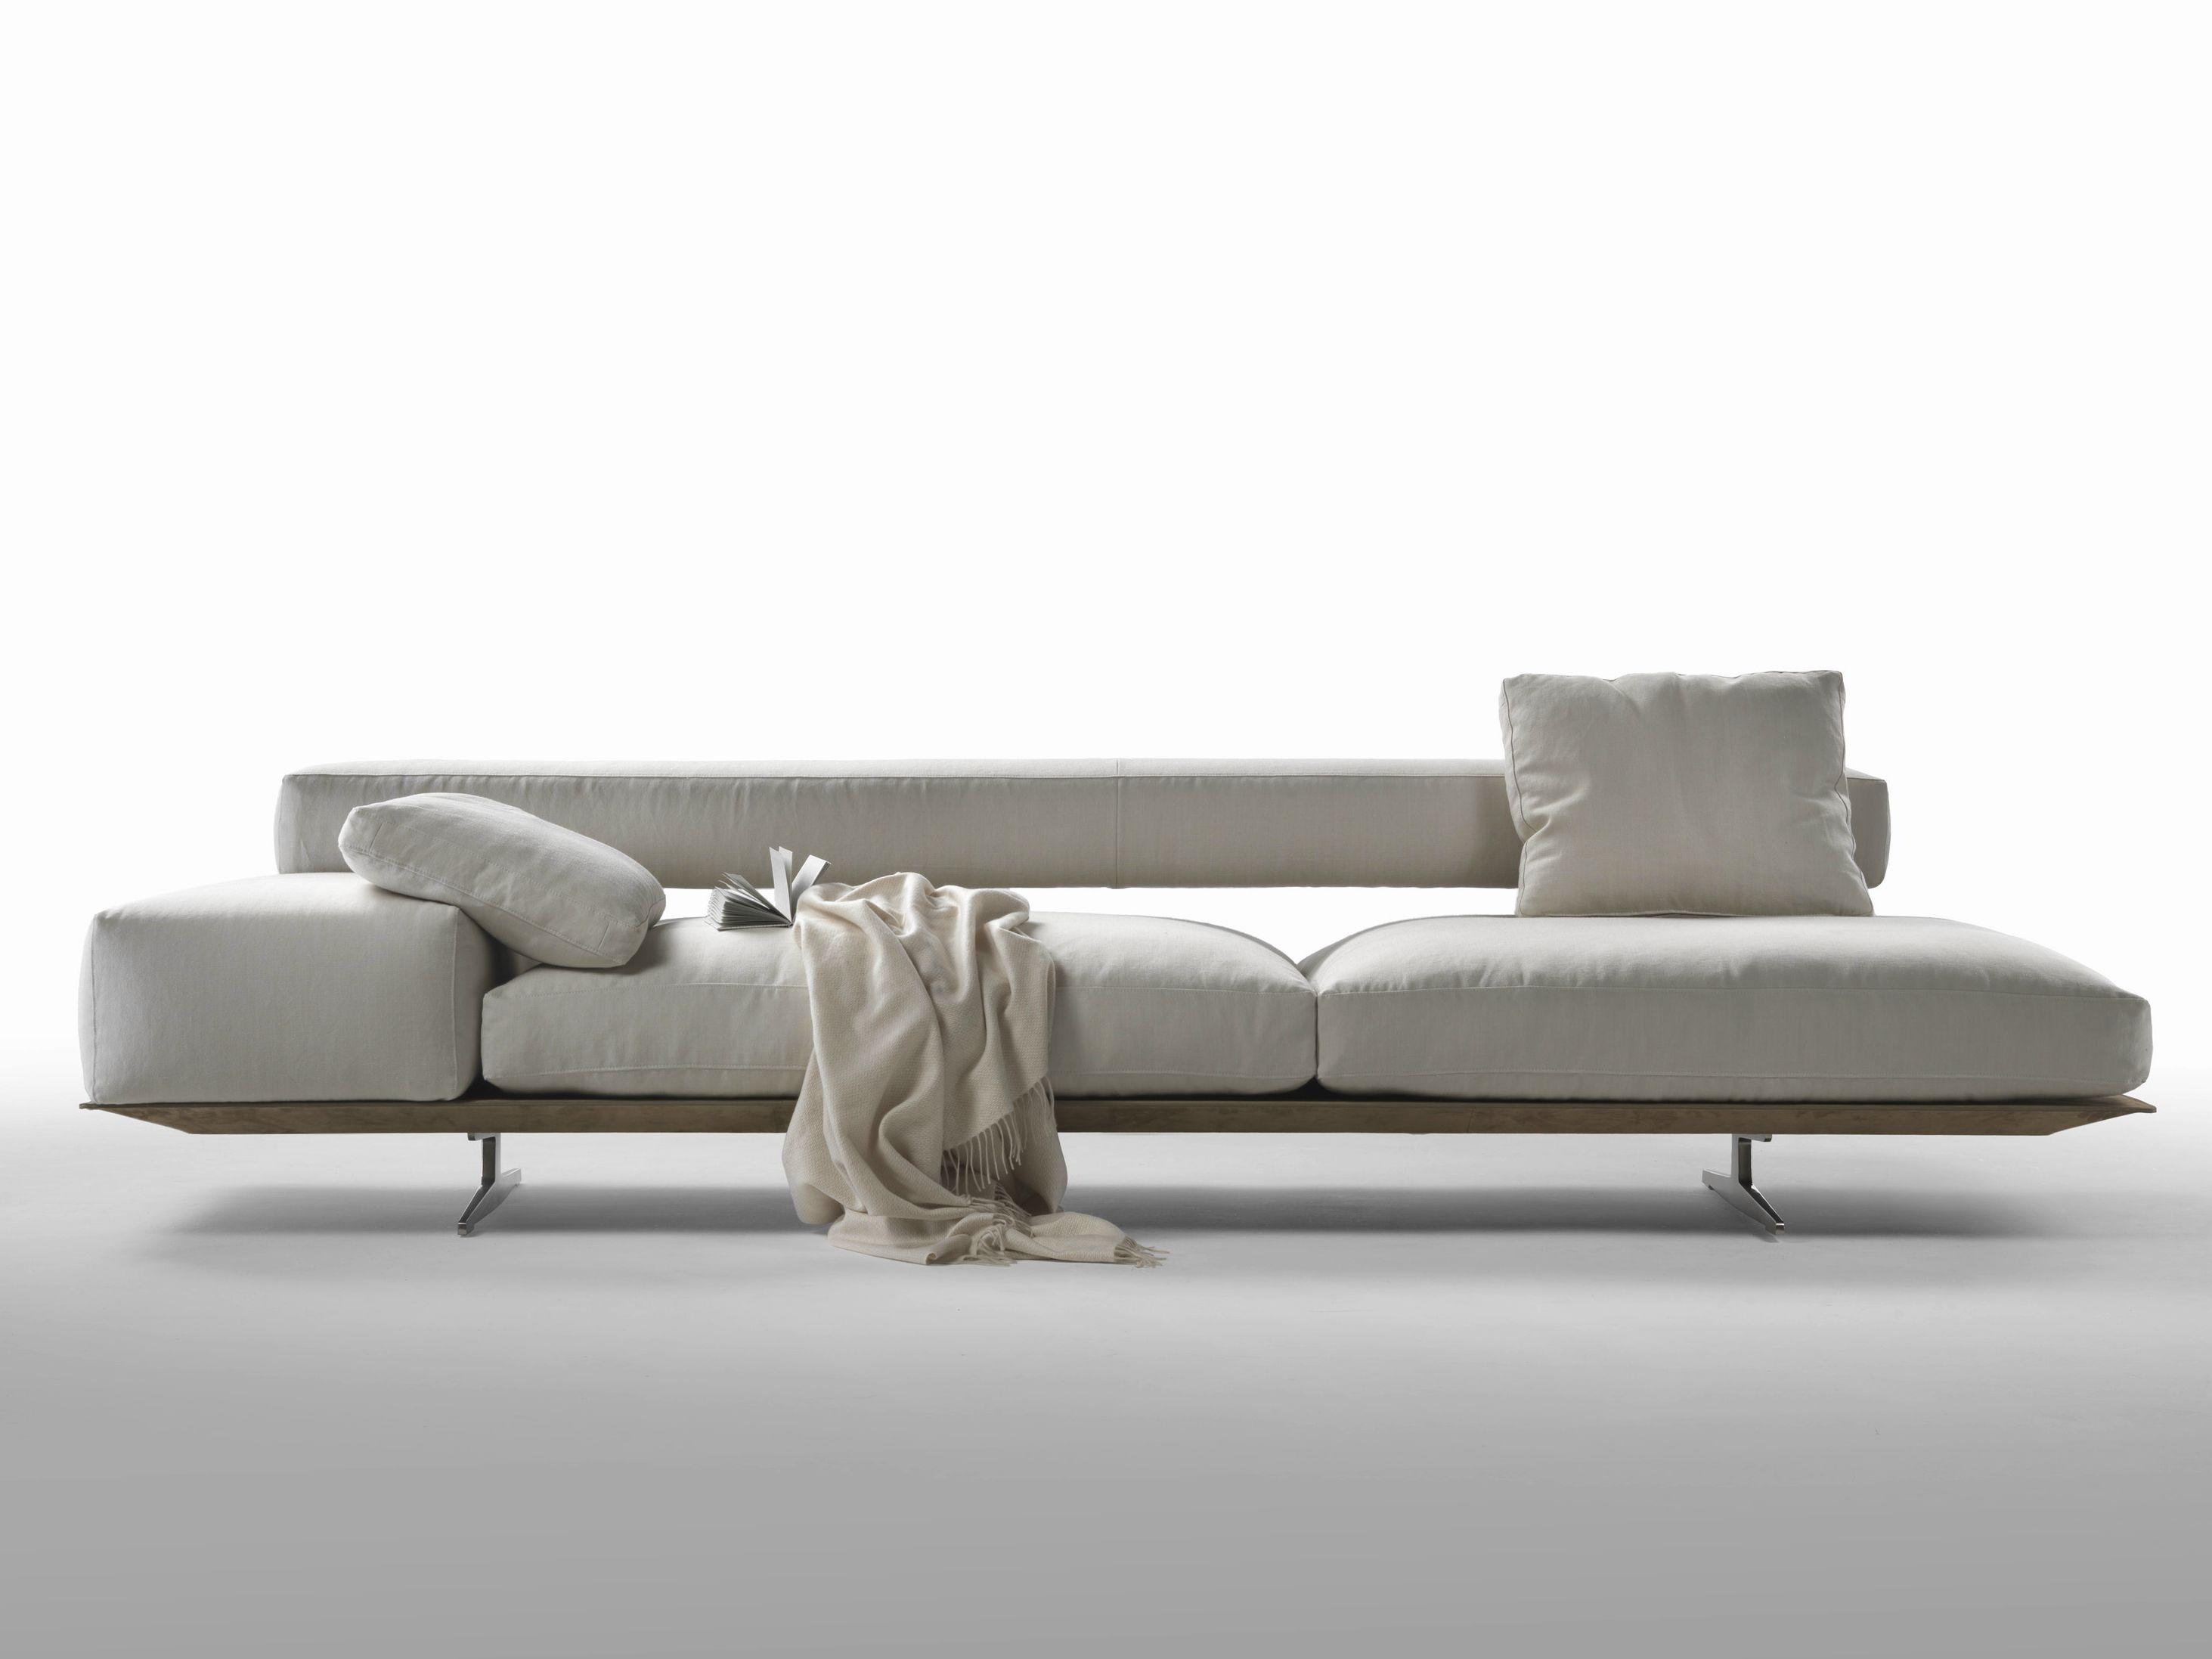 Sofa RAY Collection B&B Italia Design Antonio Citterio